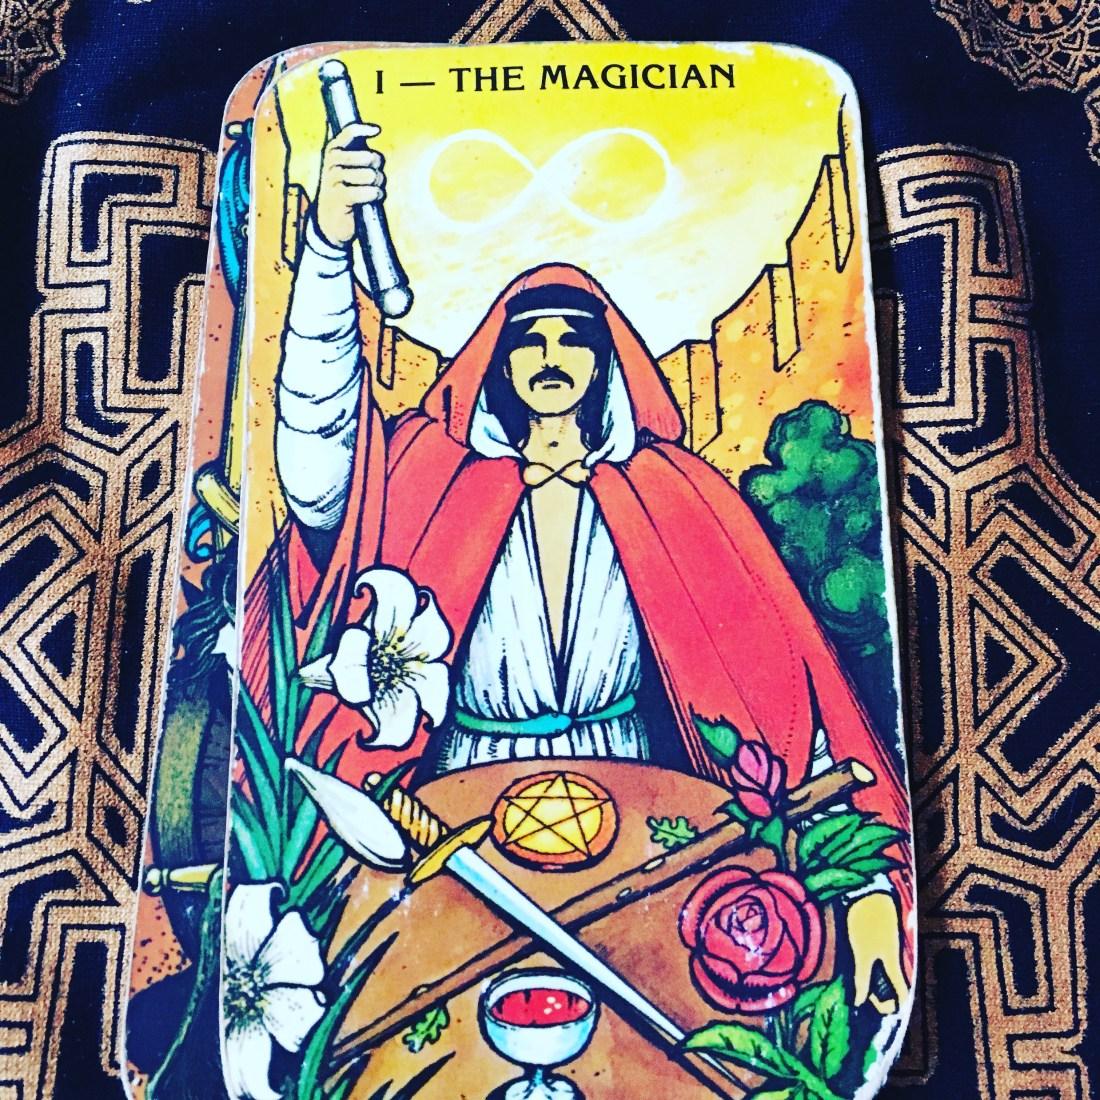 Tarot Card, The Magician, Major Arcana